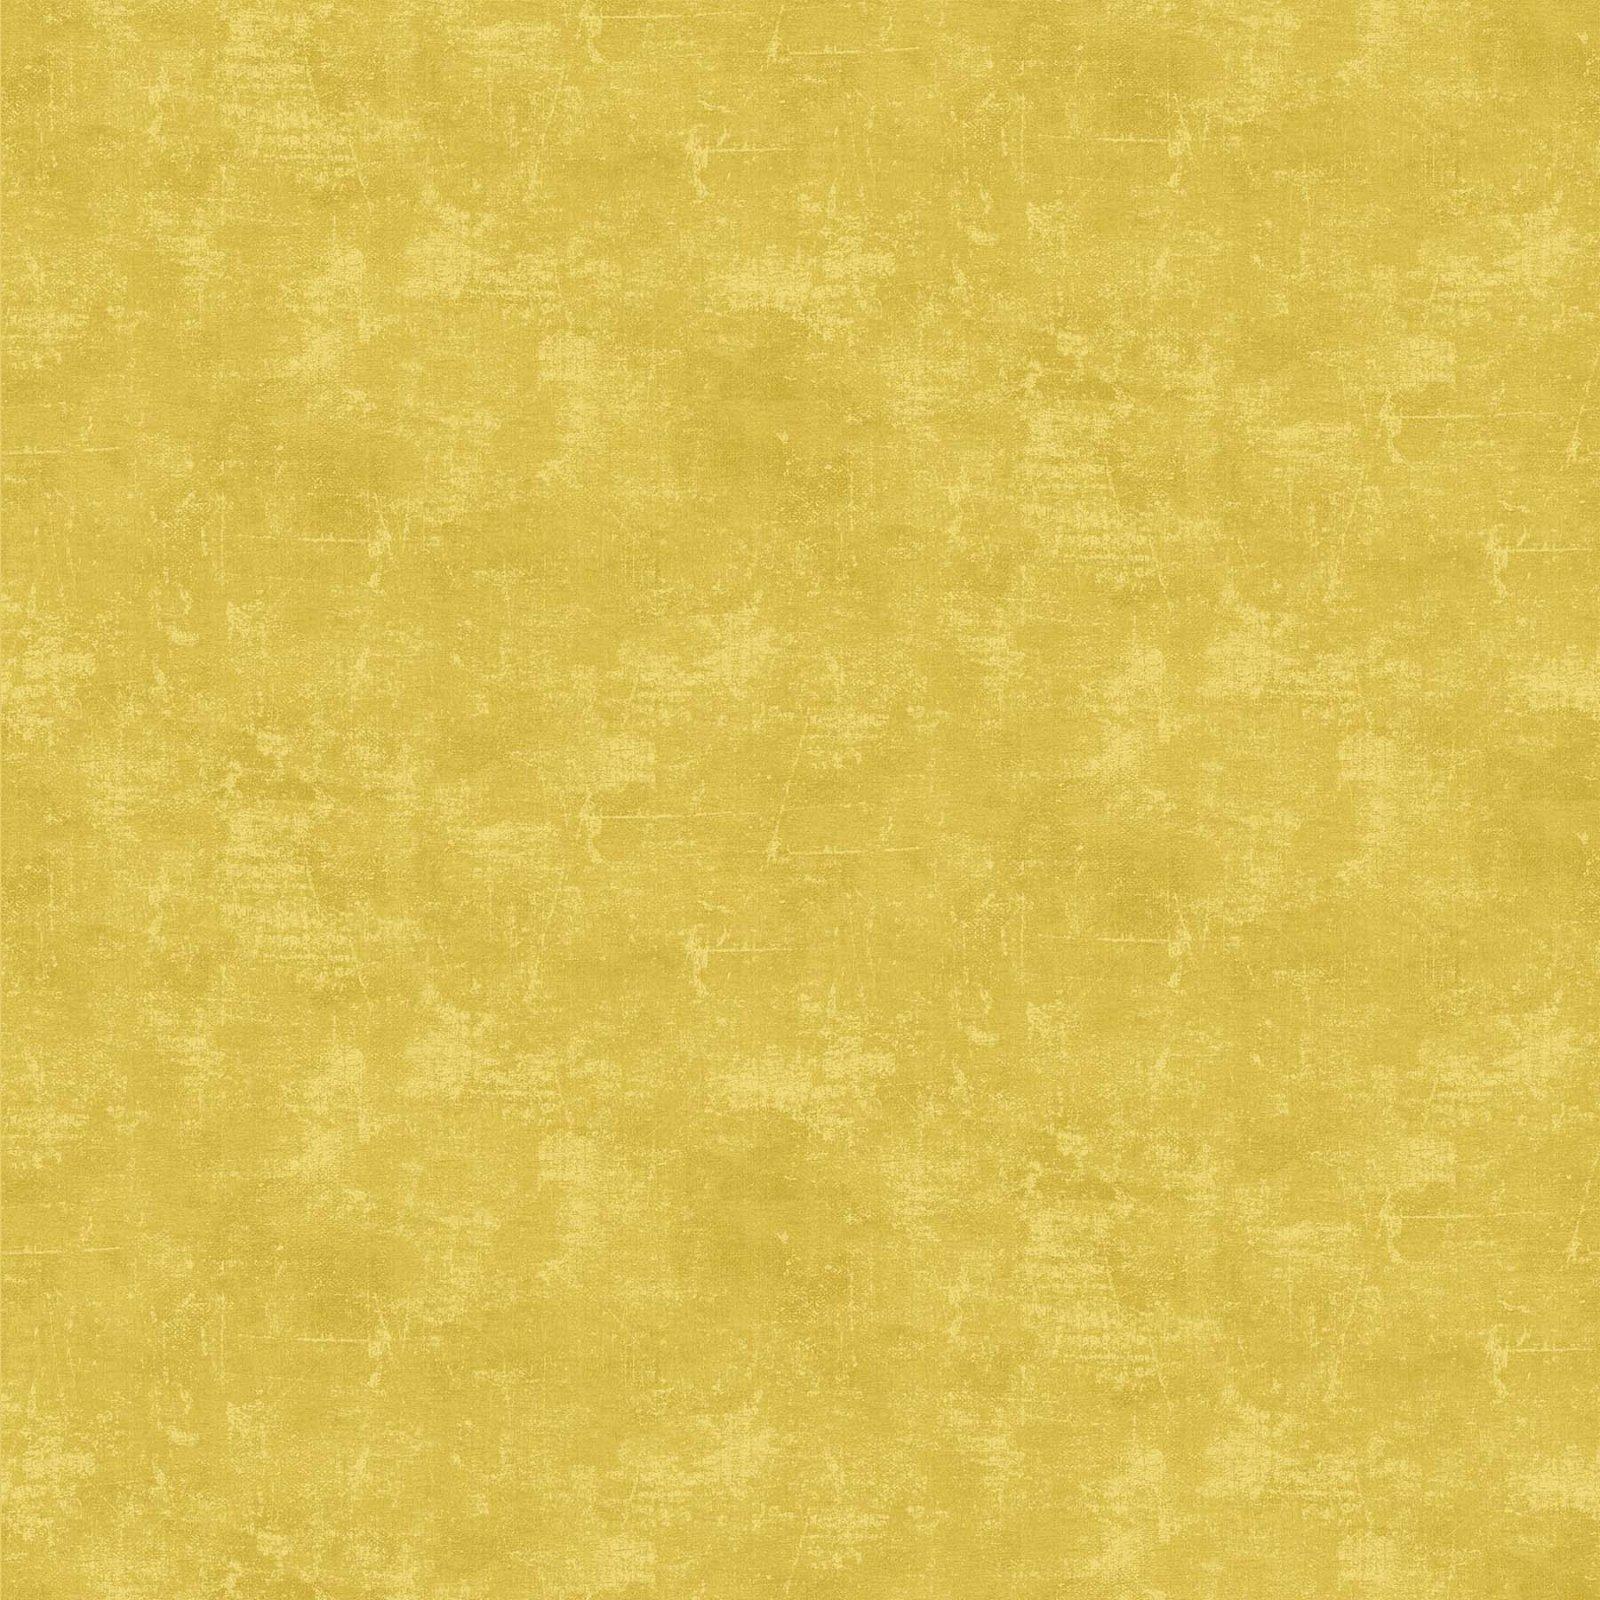 Elegantly Frightful - Spooky Gold Tonal